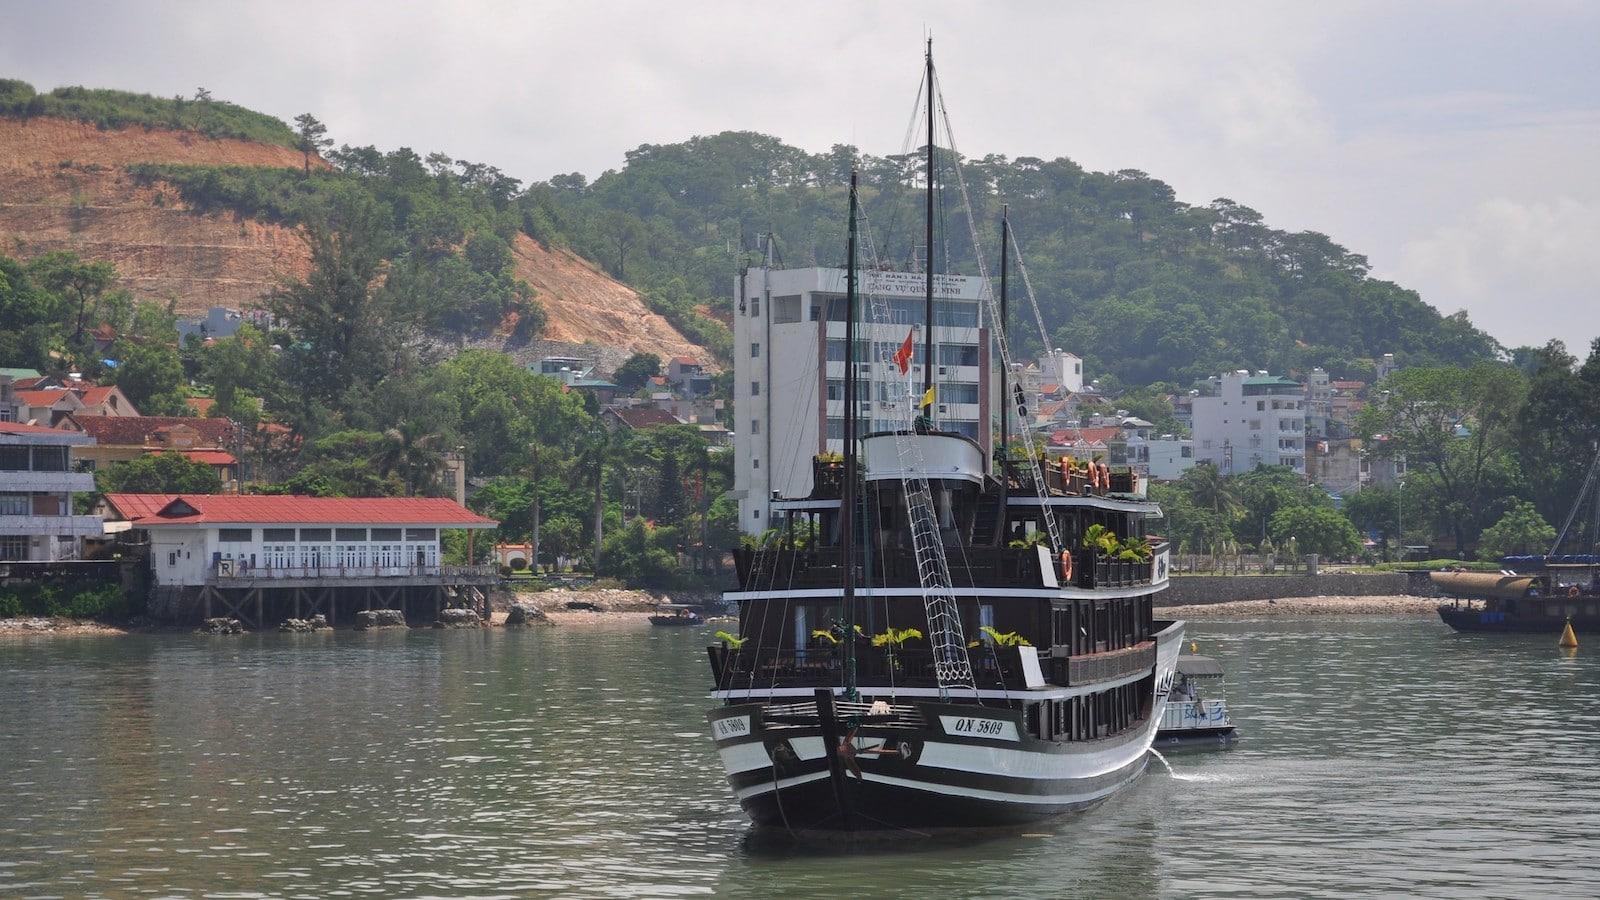 Image of the Bhaya Cruise in Halong City, Vietnam